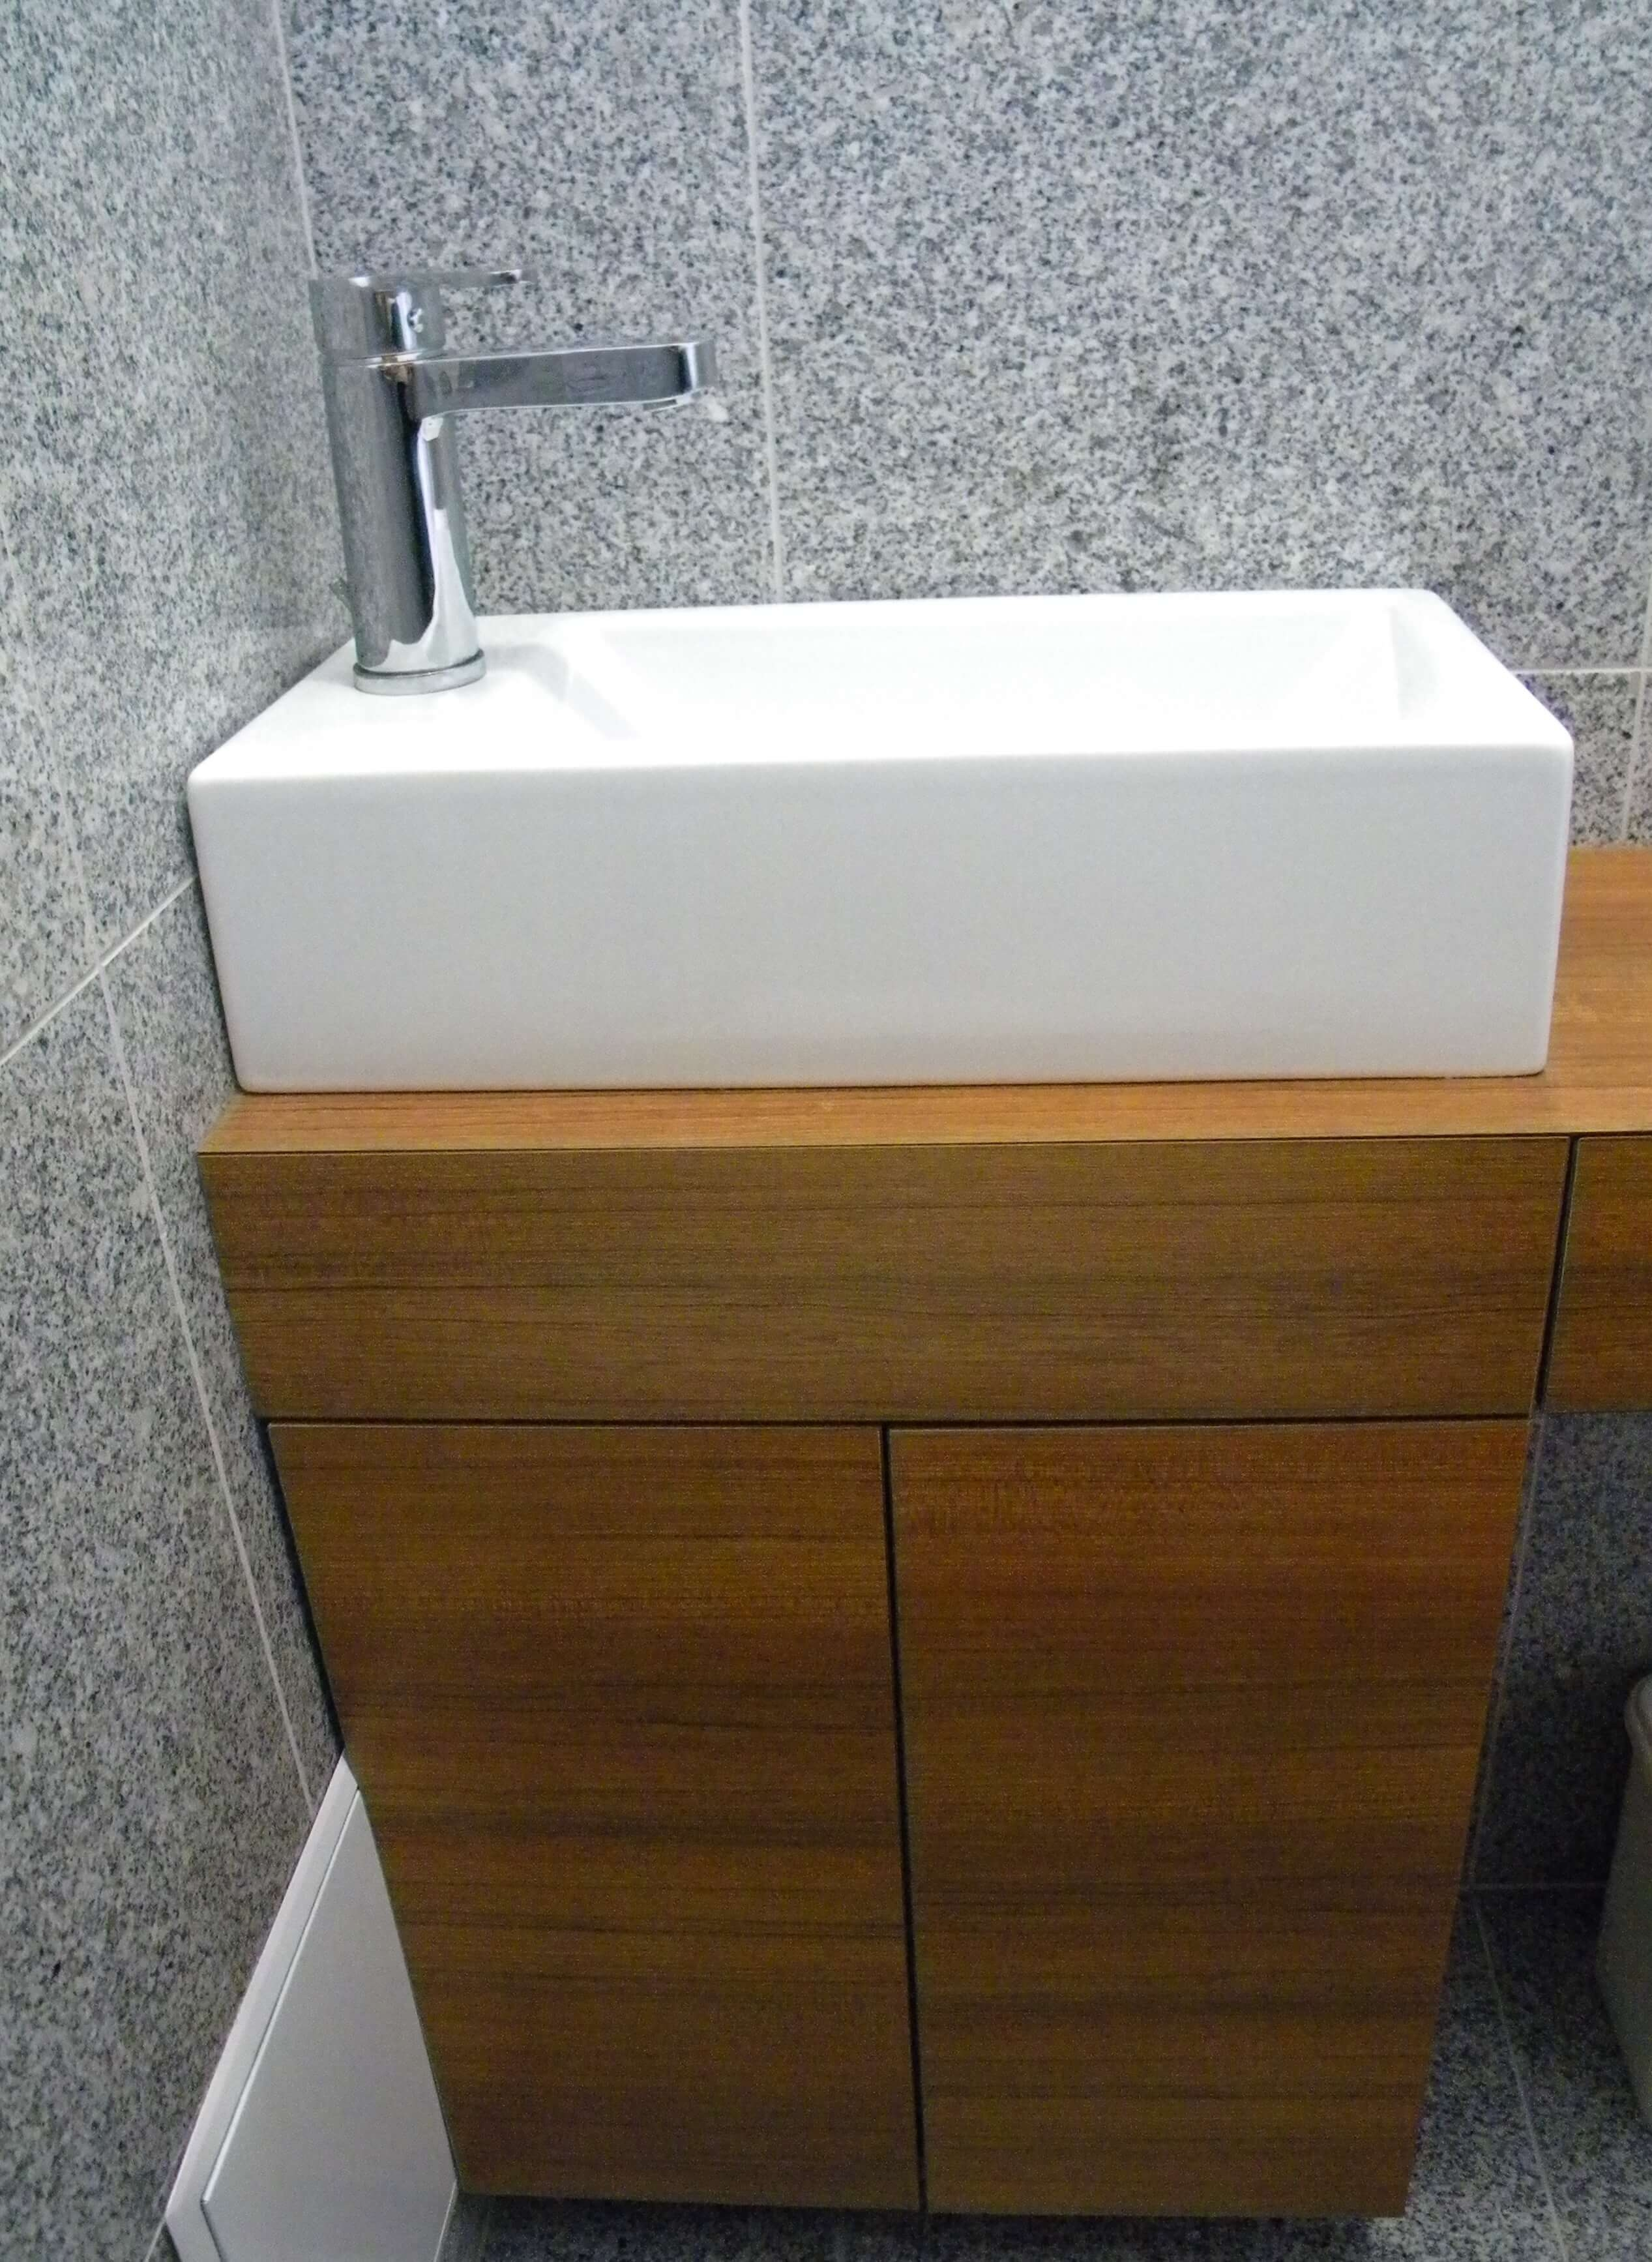 Furnirano vgradno pohištvo za kopalnico